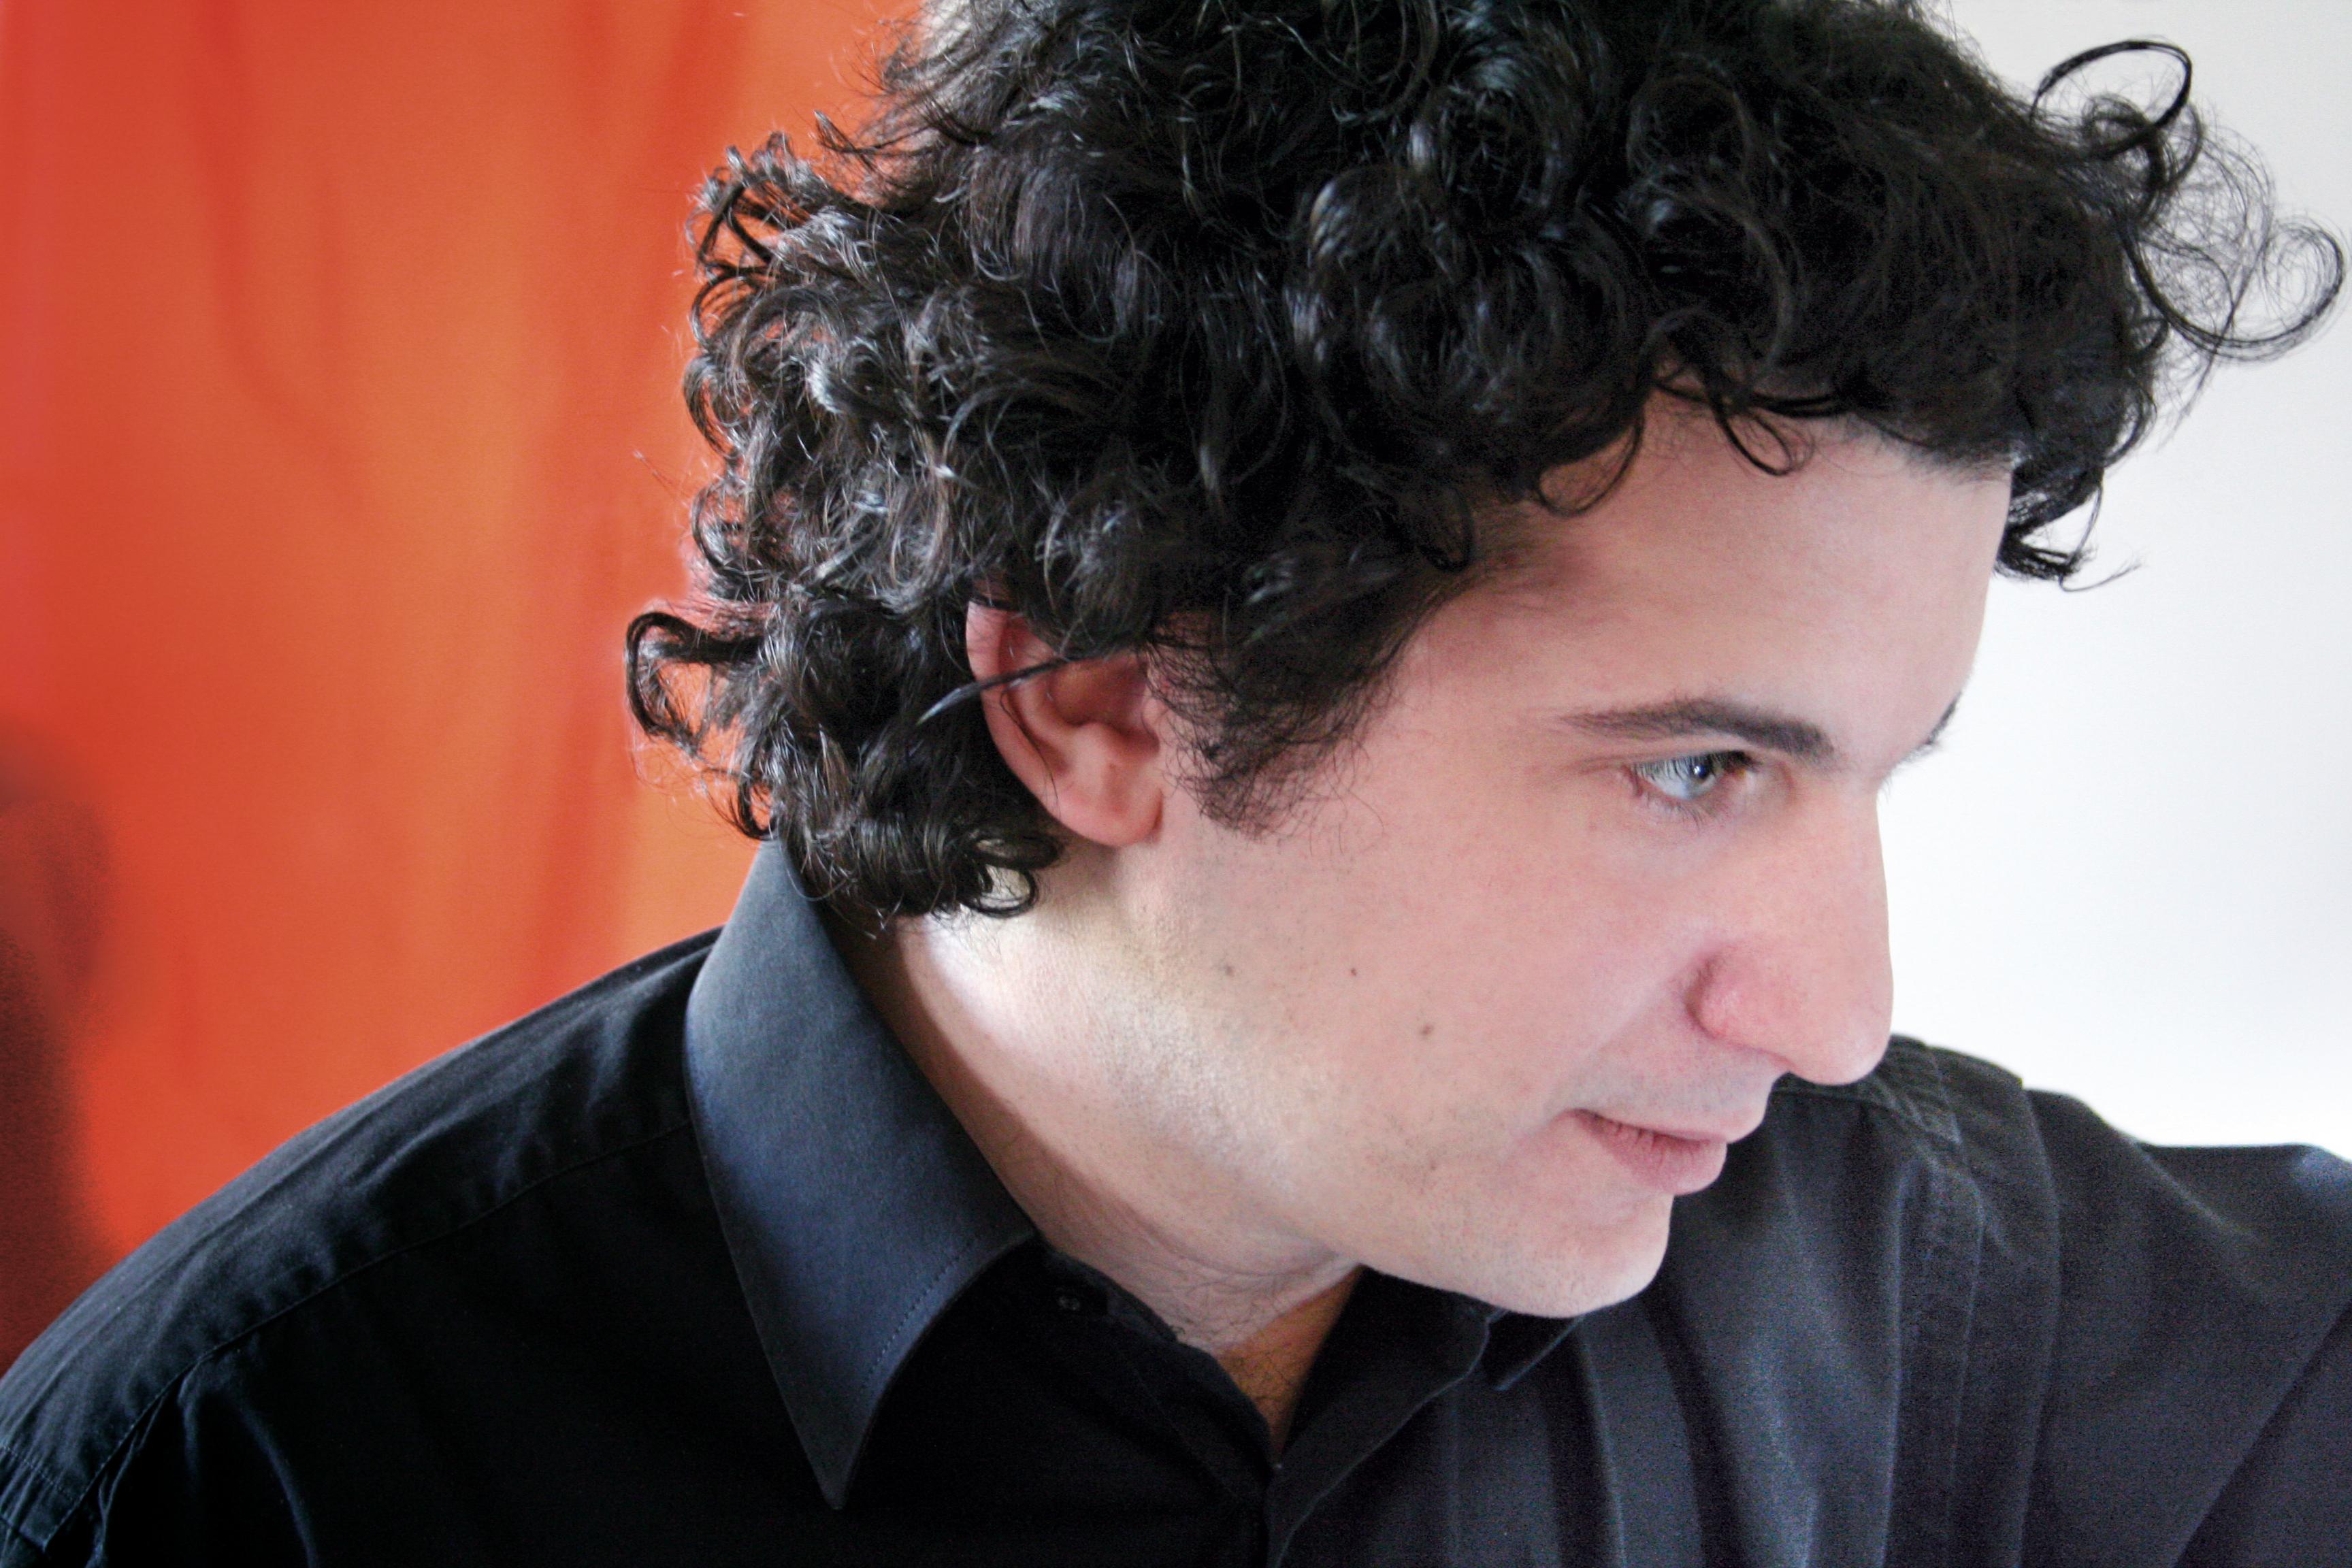 http://www.musicaglotz.com/wp-content/uploads/2011/03/Alain-Altinoglu-CouleurRVB-Photo-Pierre-Yves-Rambaud2.jpg